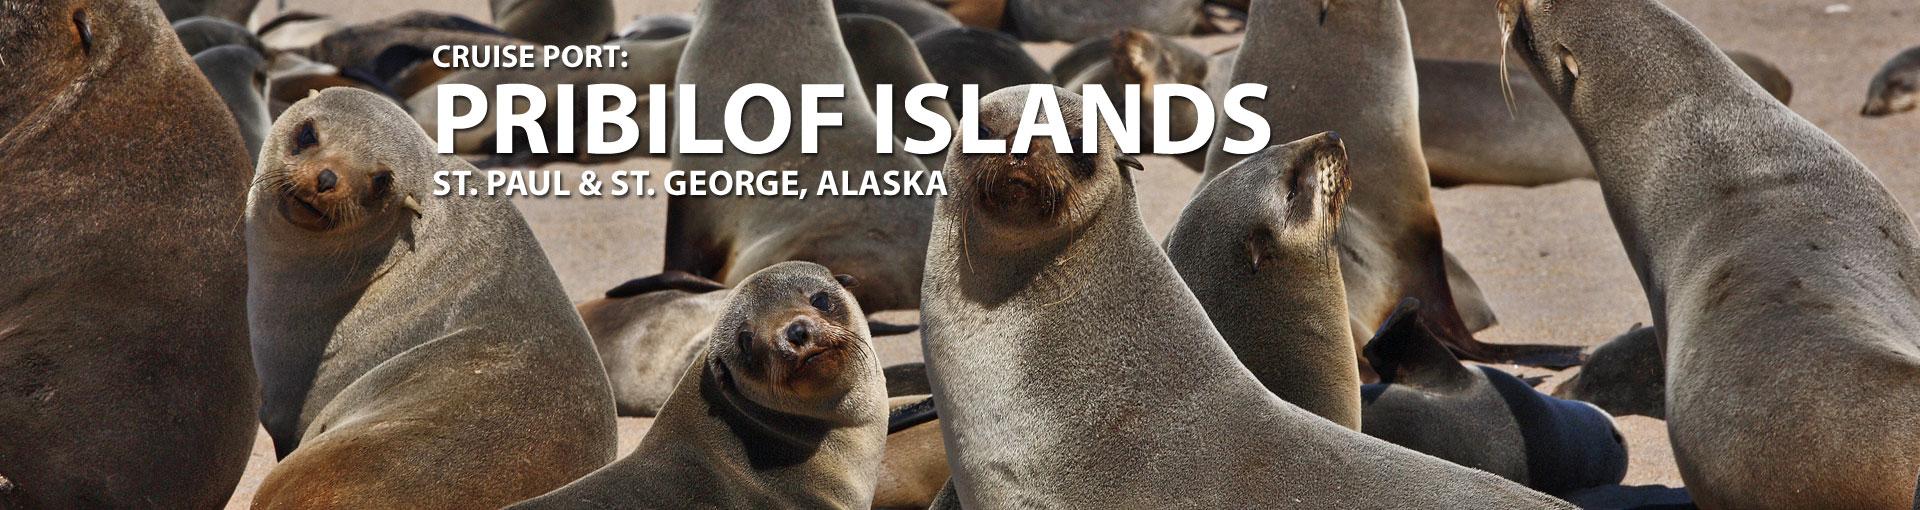 Pribilof Islands (St. Paul And St. George), Alaska